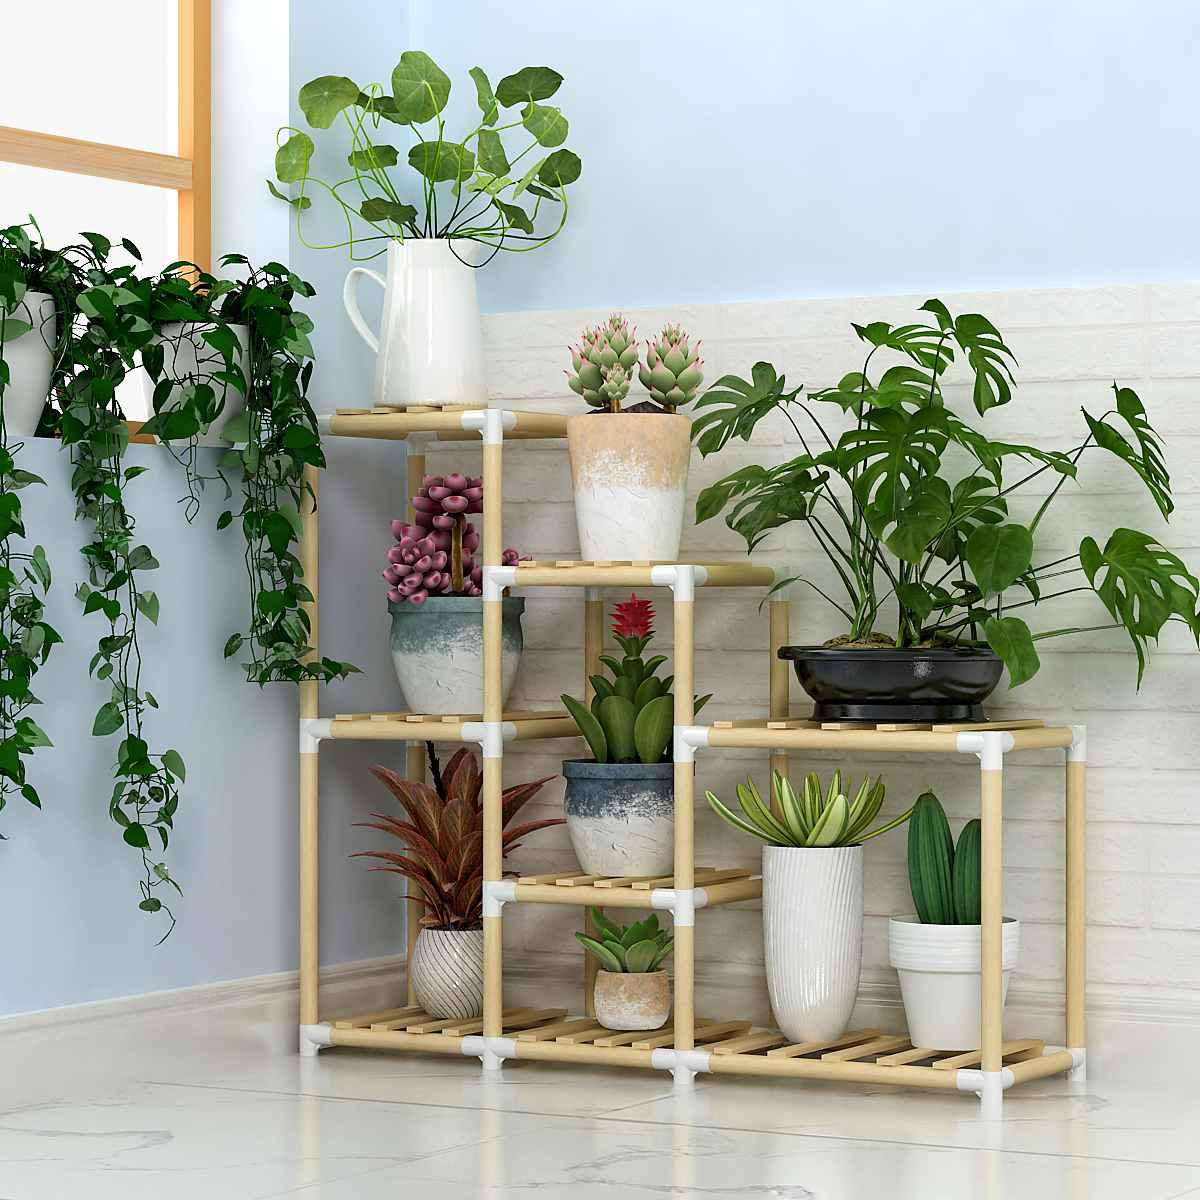 Flower Pot Rack Wooden Potted Plant Rack Storage Shelf Fashionable Flower Plants Stand Indoor Decor Plant Pot Holder